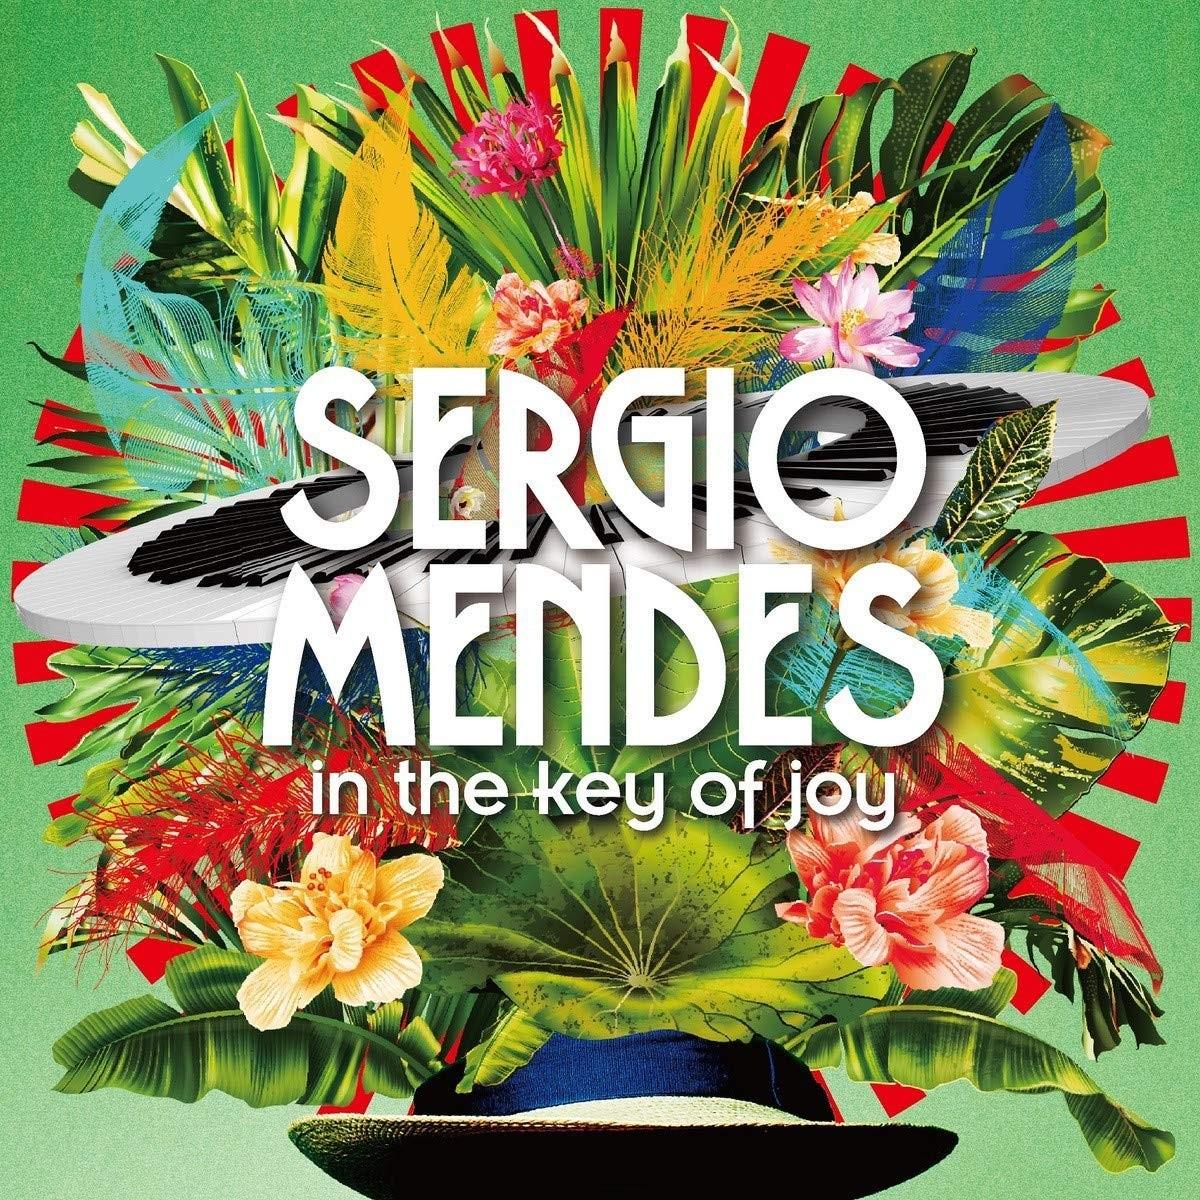 Sergio Mendes - In The Key Of Joy Vinyl LP